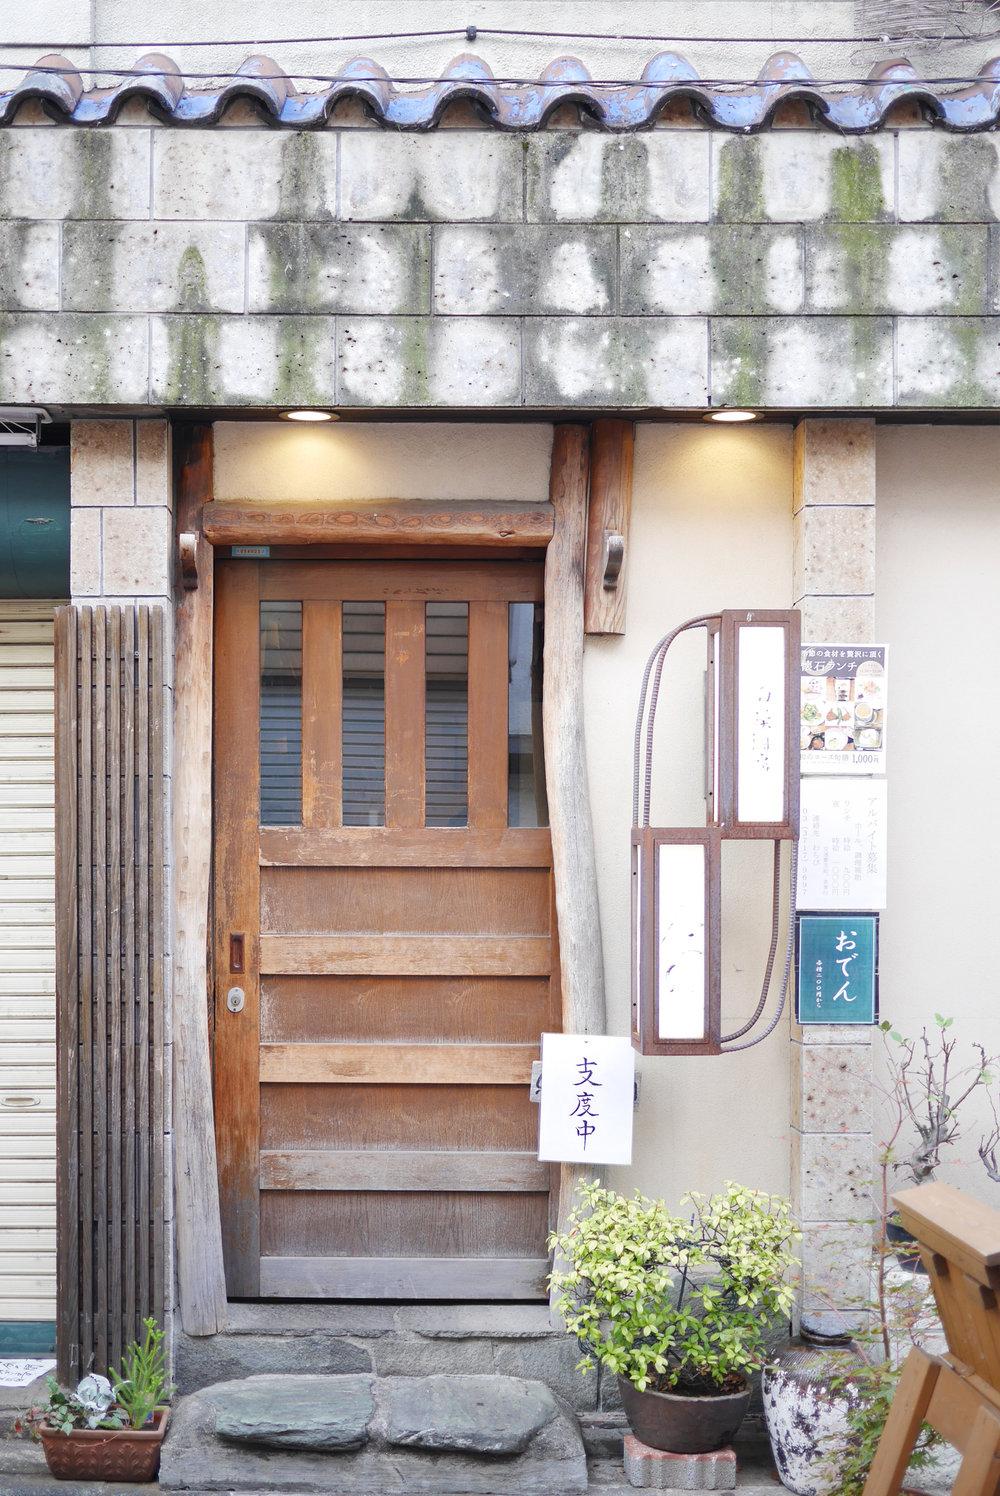 GunawanMelisa_Tokyo2016Jiyugaoka23